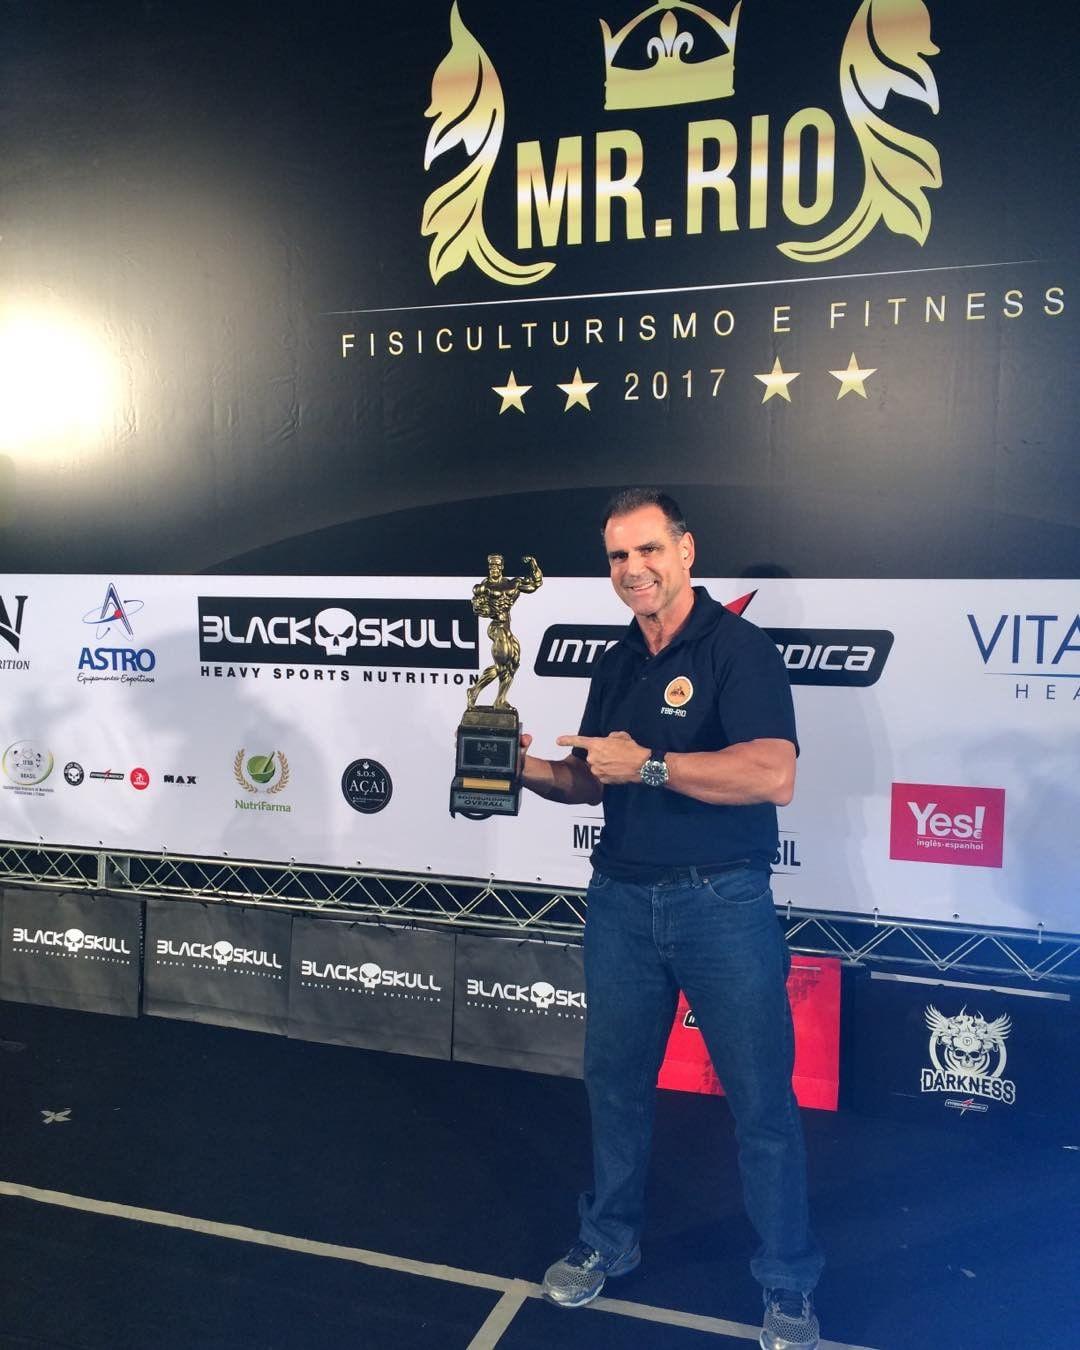 Gustavo Costa no campeonato Mr. Rio 2017, organizado pela IFBB-RIO. Foto: Arquivo pessoal